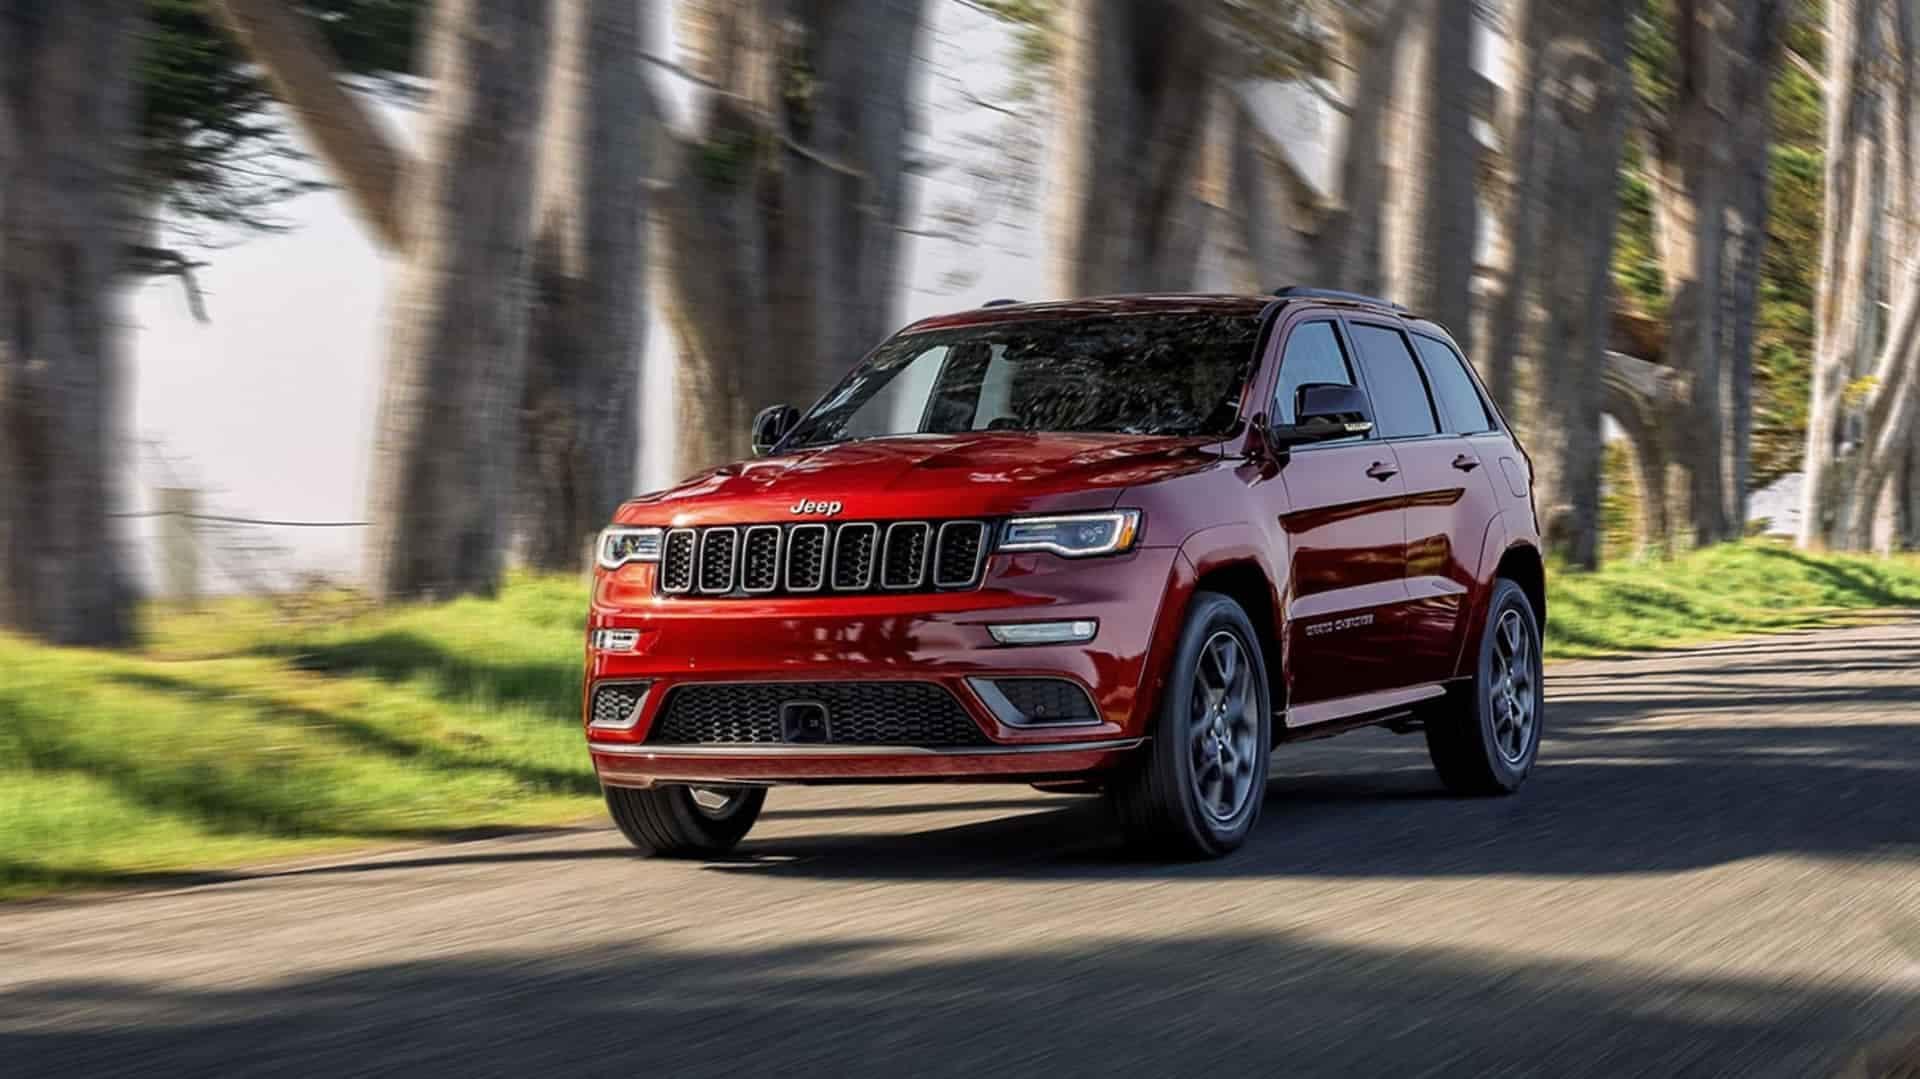 Lease a 2020 Jeep Grand Cherokee near Longmont CO